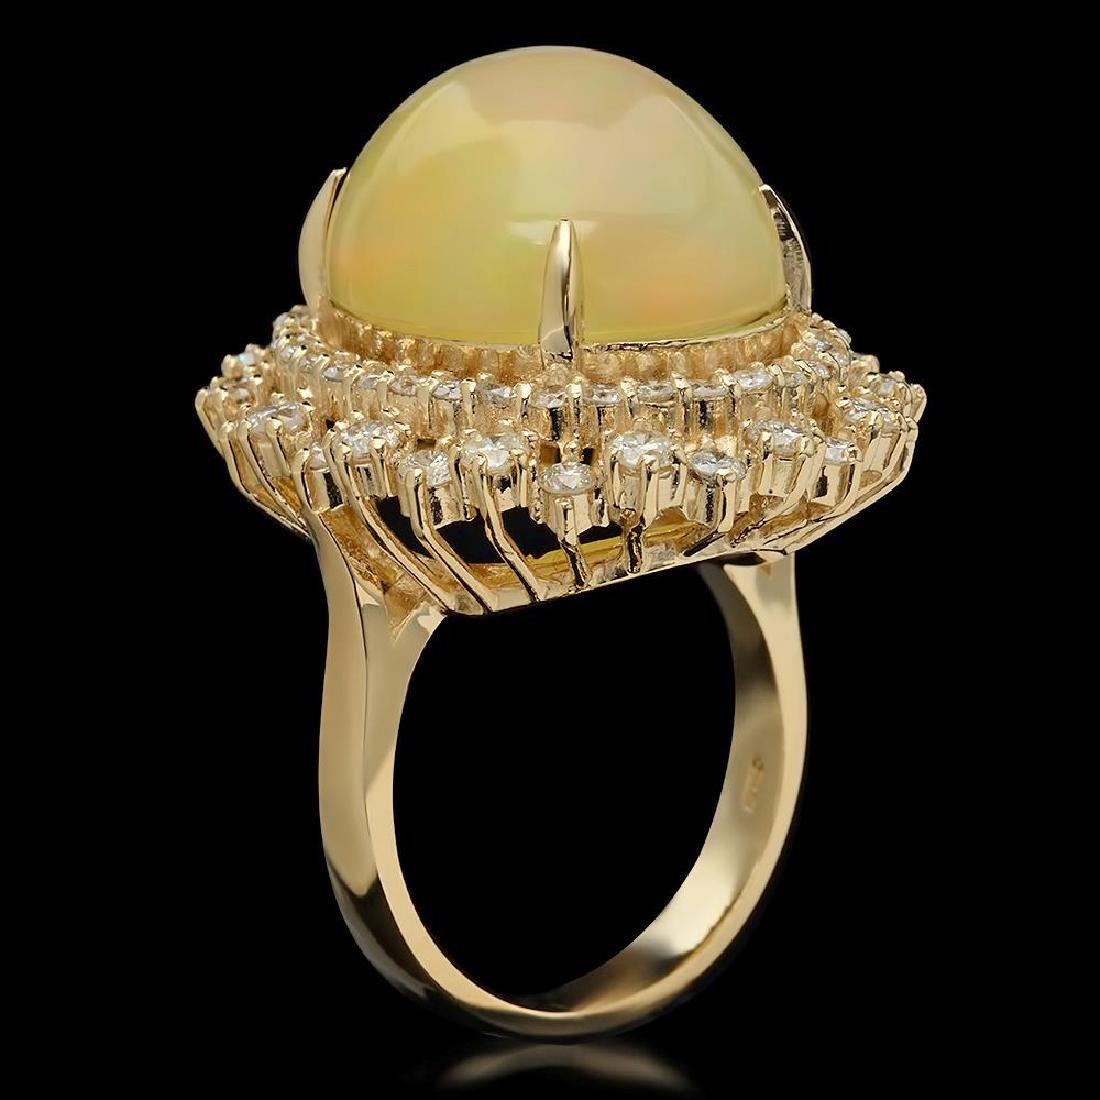 14K Gold 12.56ct Opal & 2.07ct Diamond Ring - 2